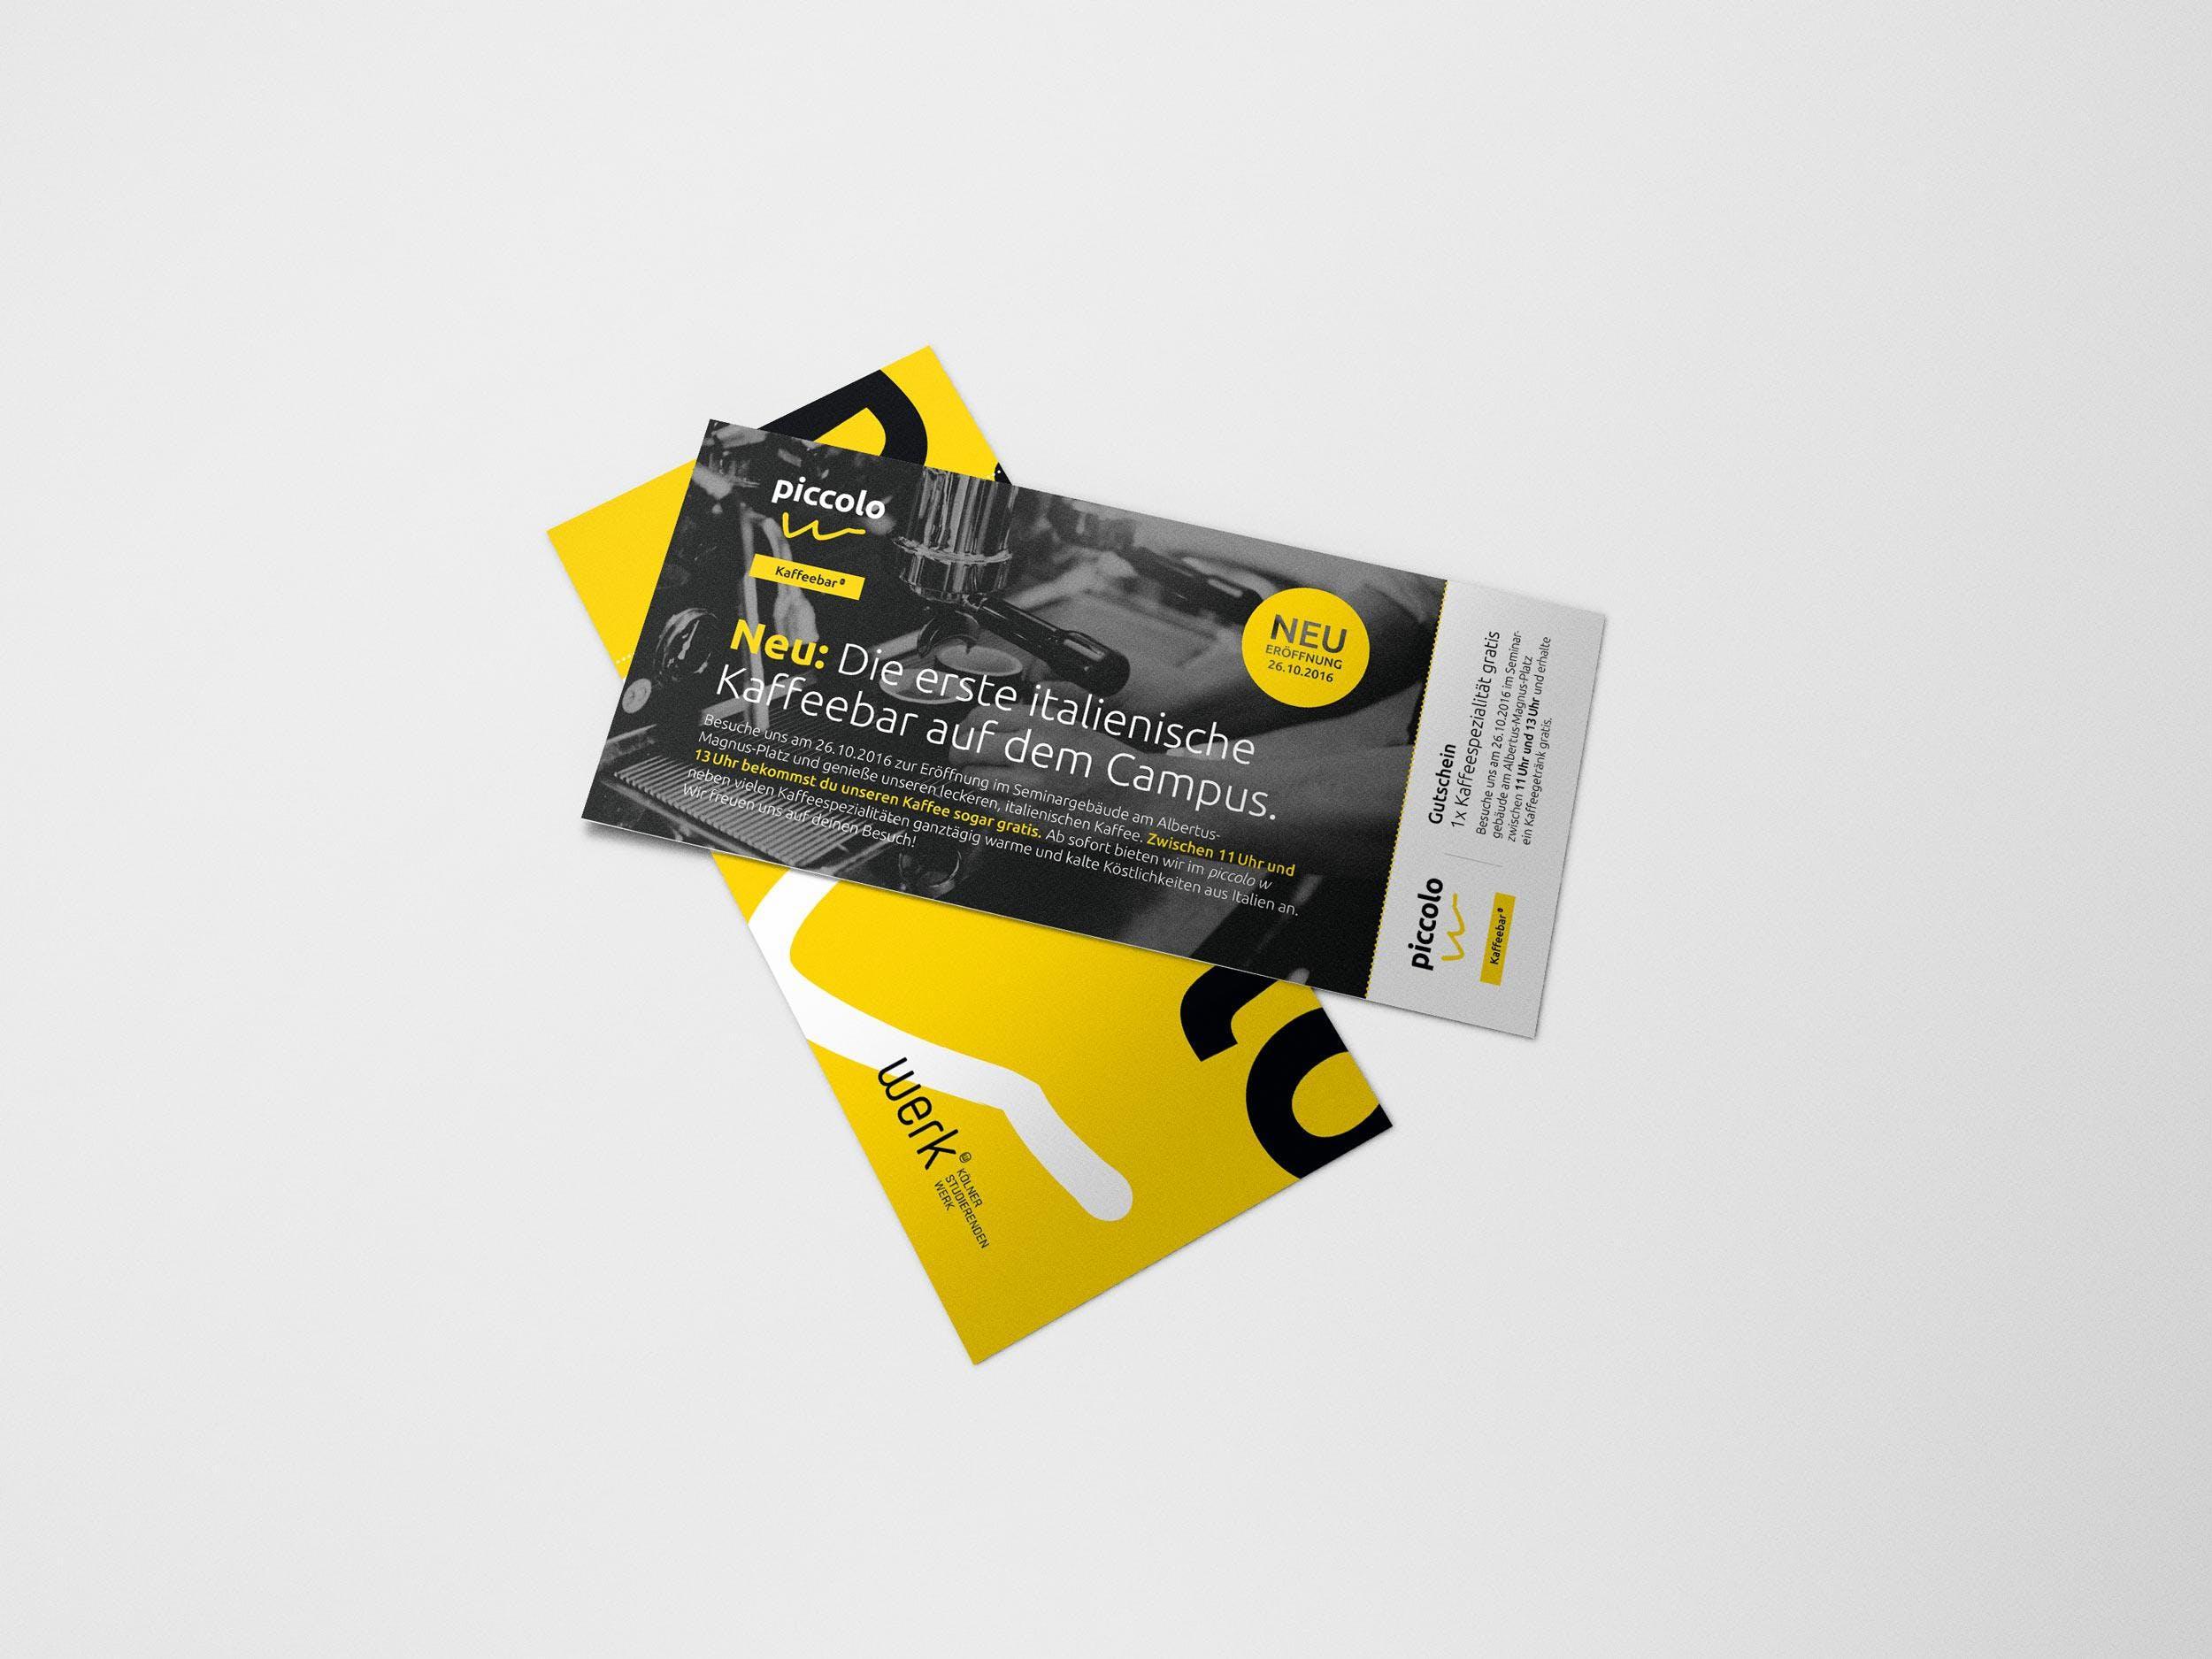 Picollo flyer